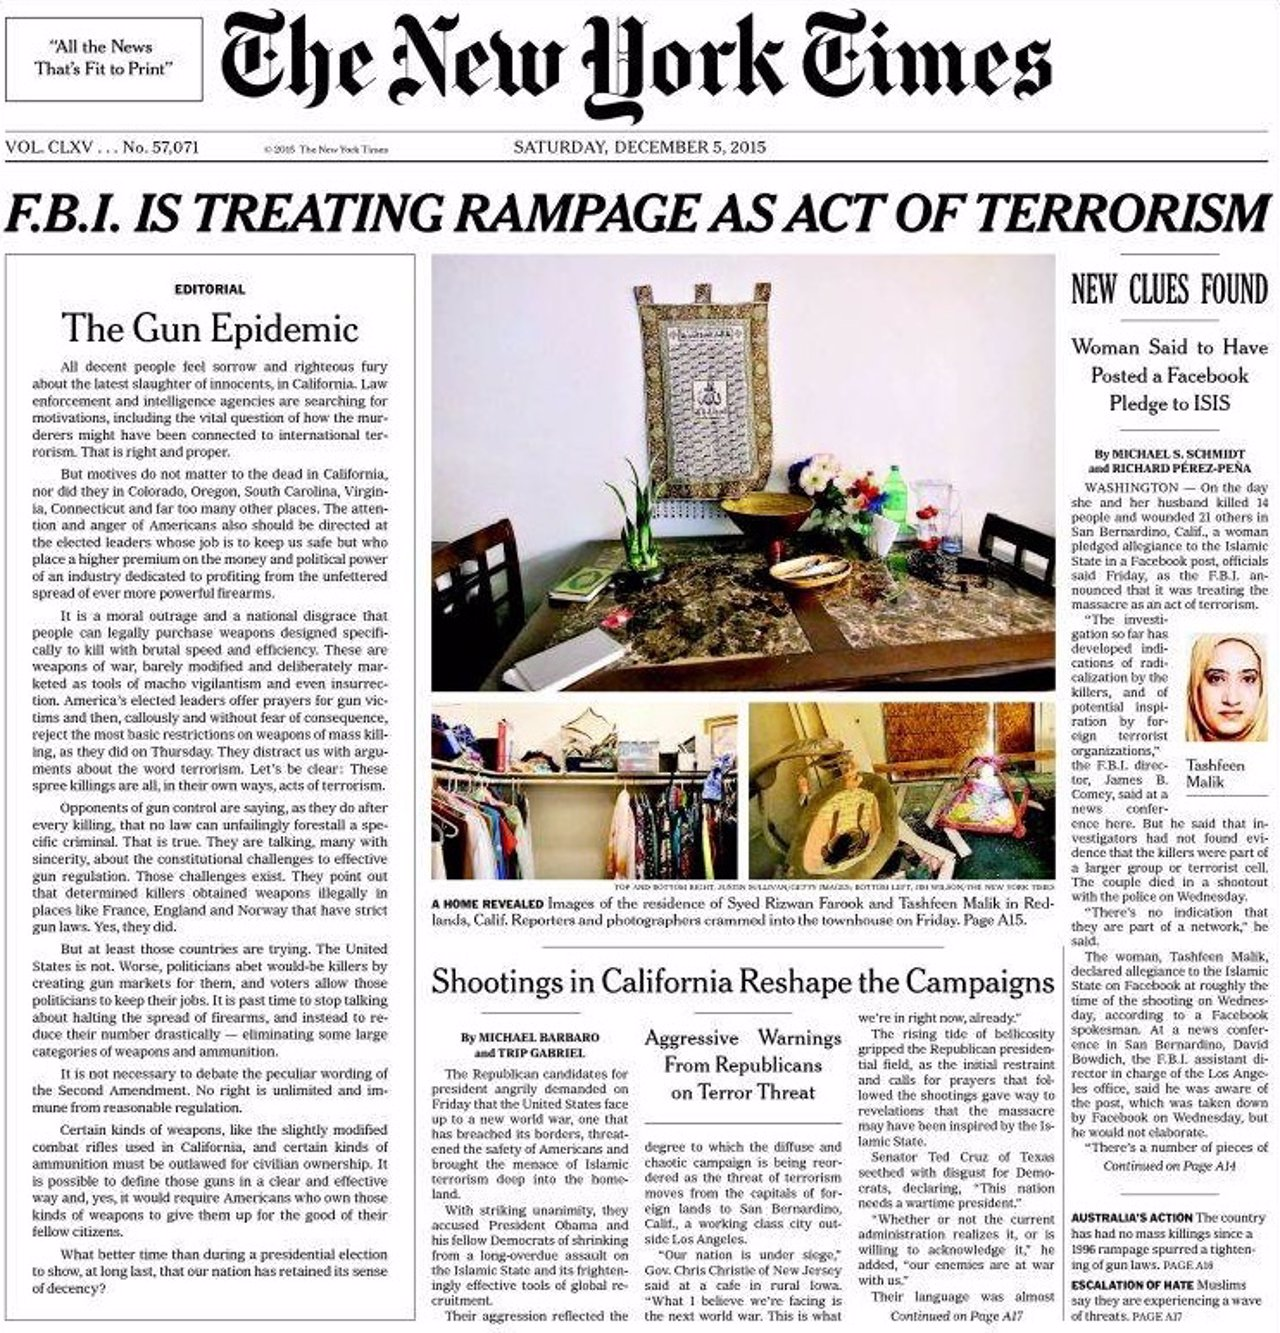 Editorial en portada del New York Times sobre el control de armas